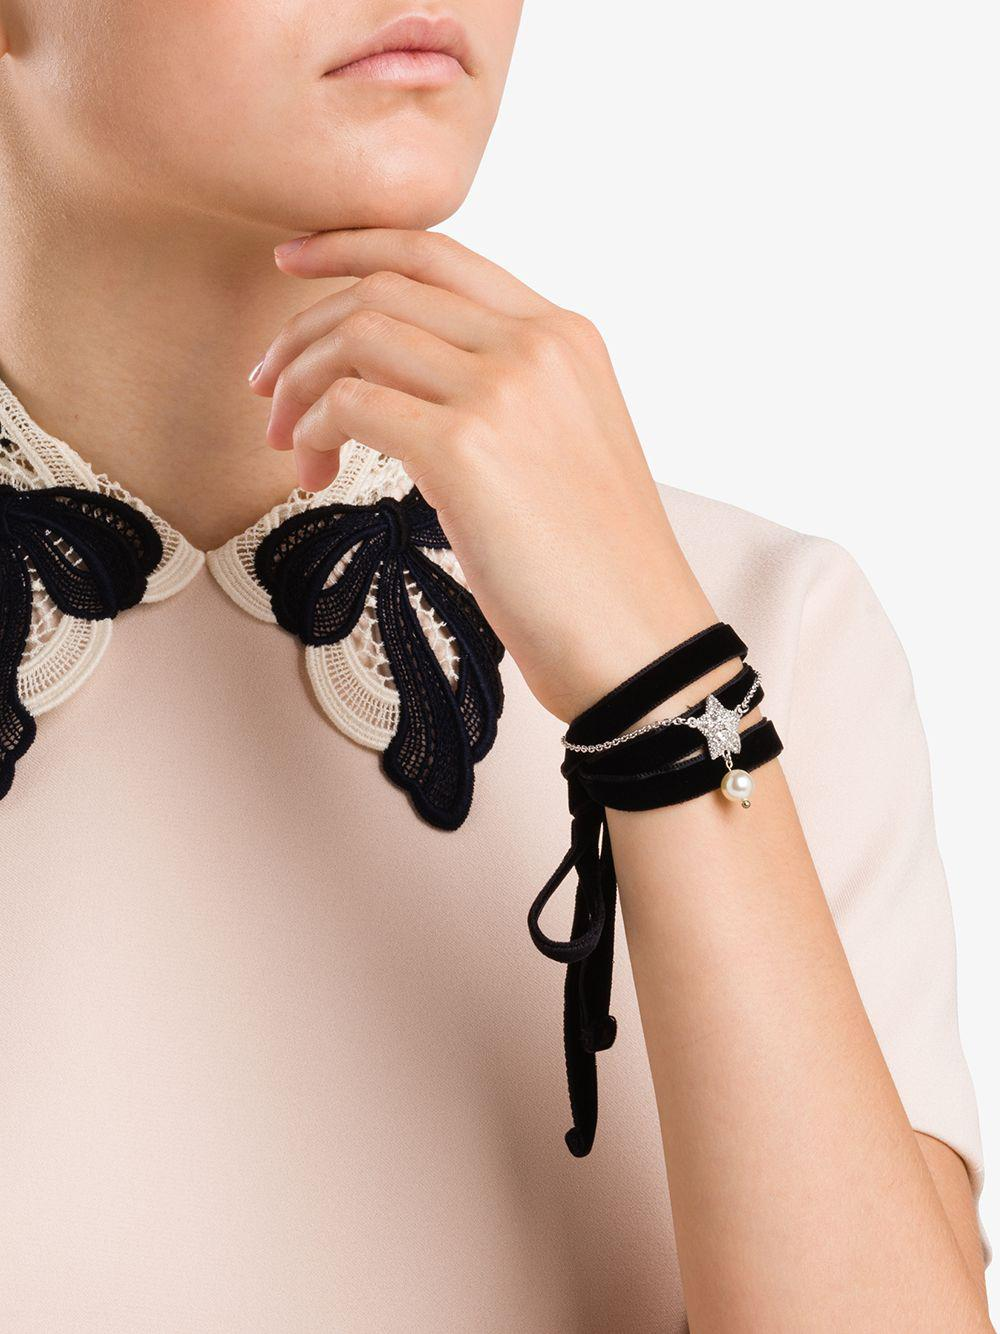 4e53d4a5b056 Miu Miu - Black Crystal And Pearl Wrap Bracelet - Lyst. View fullscreen